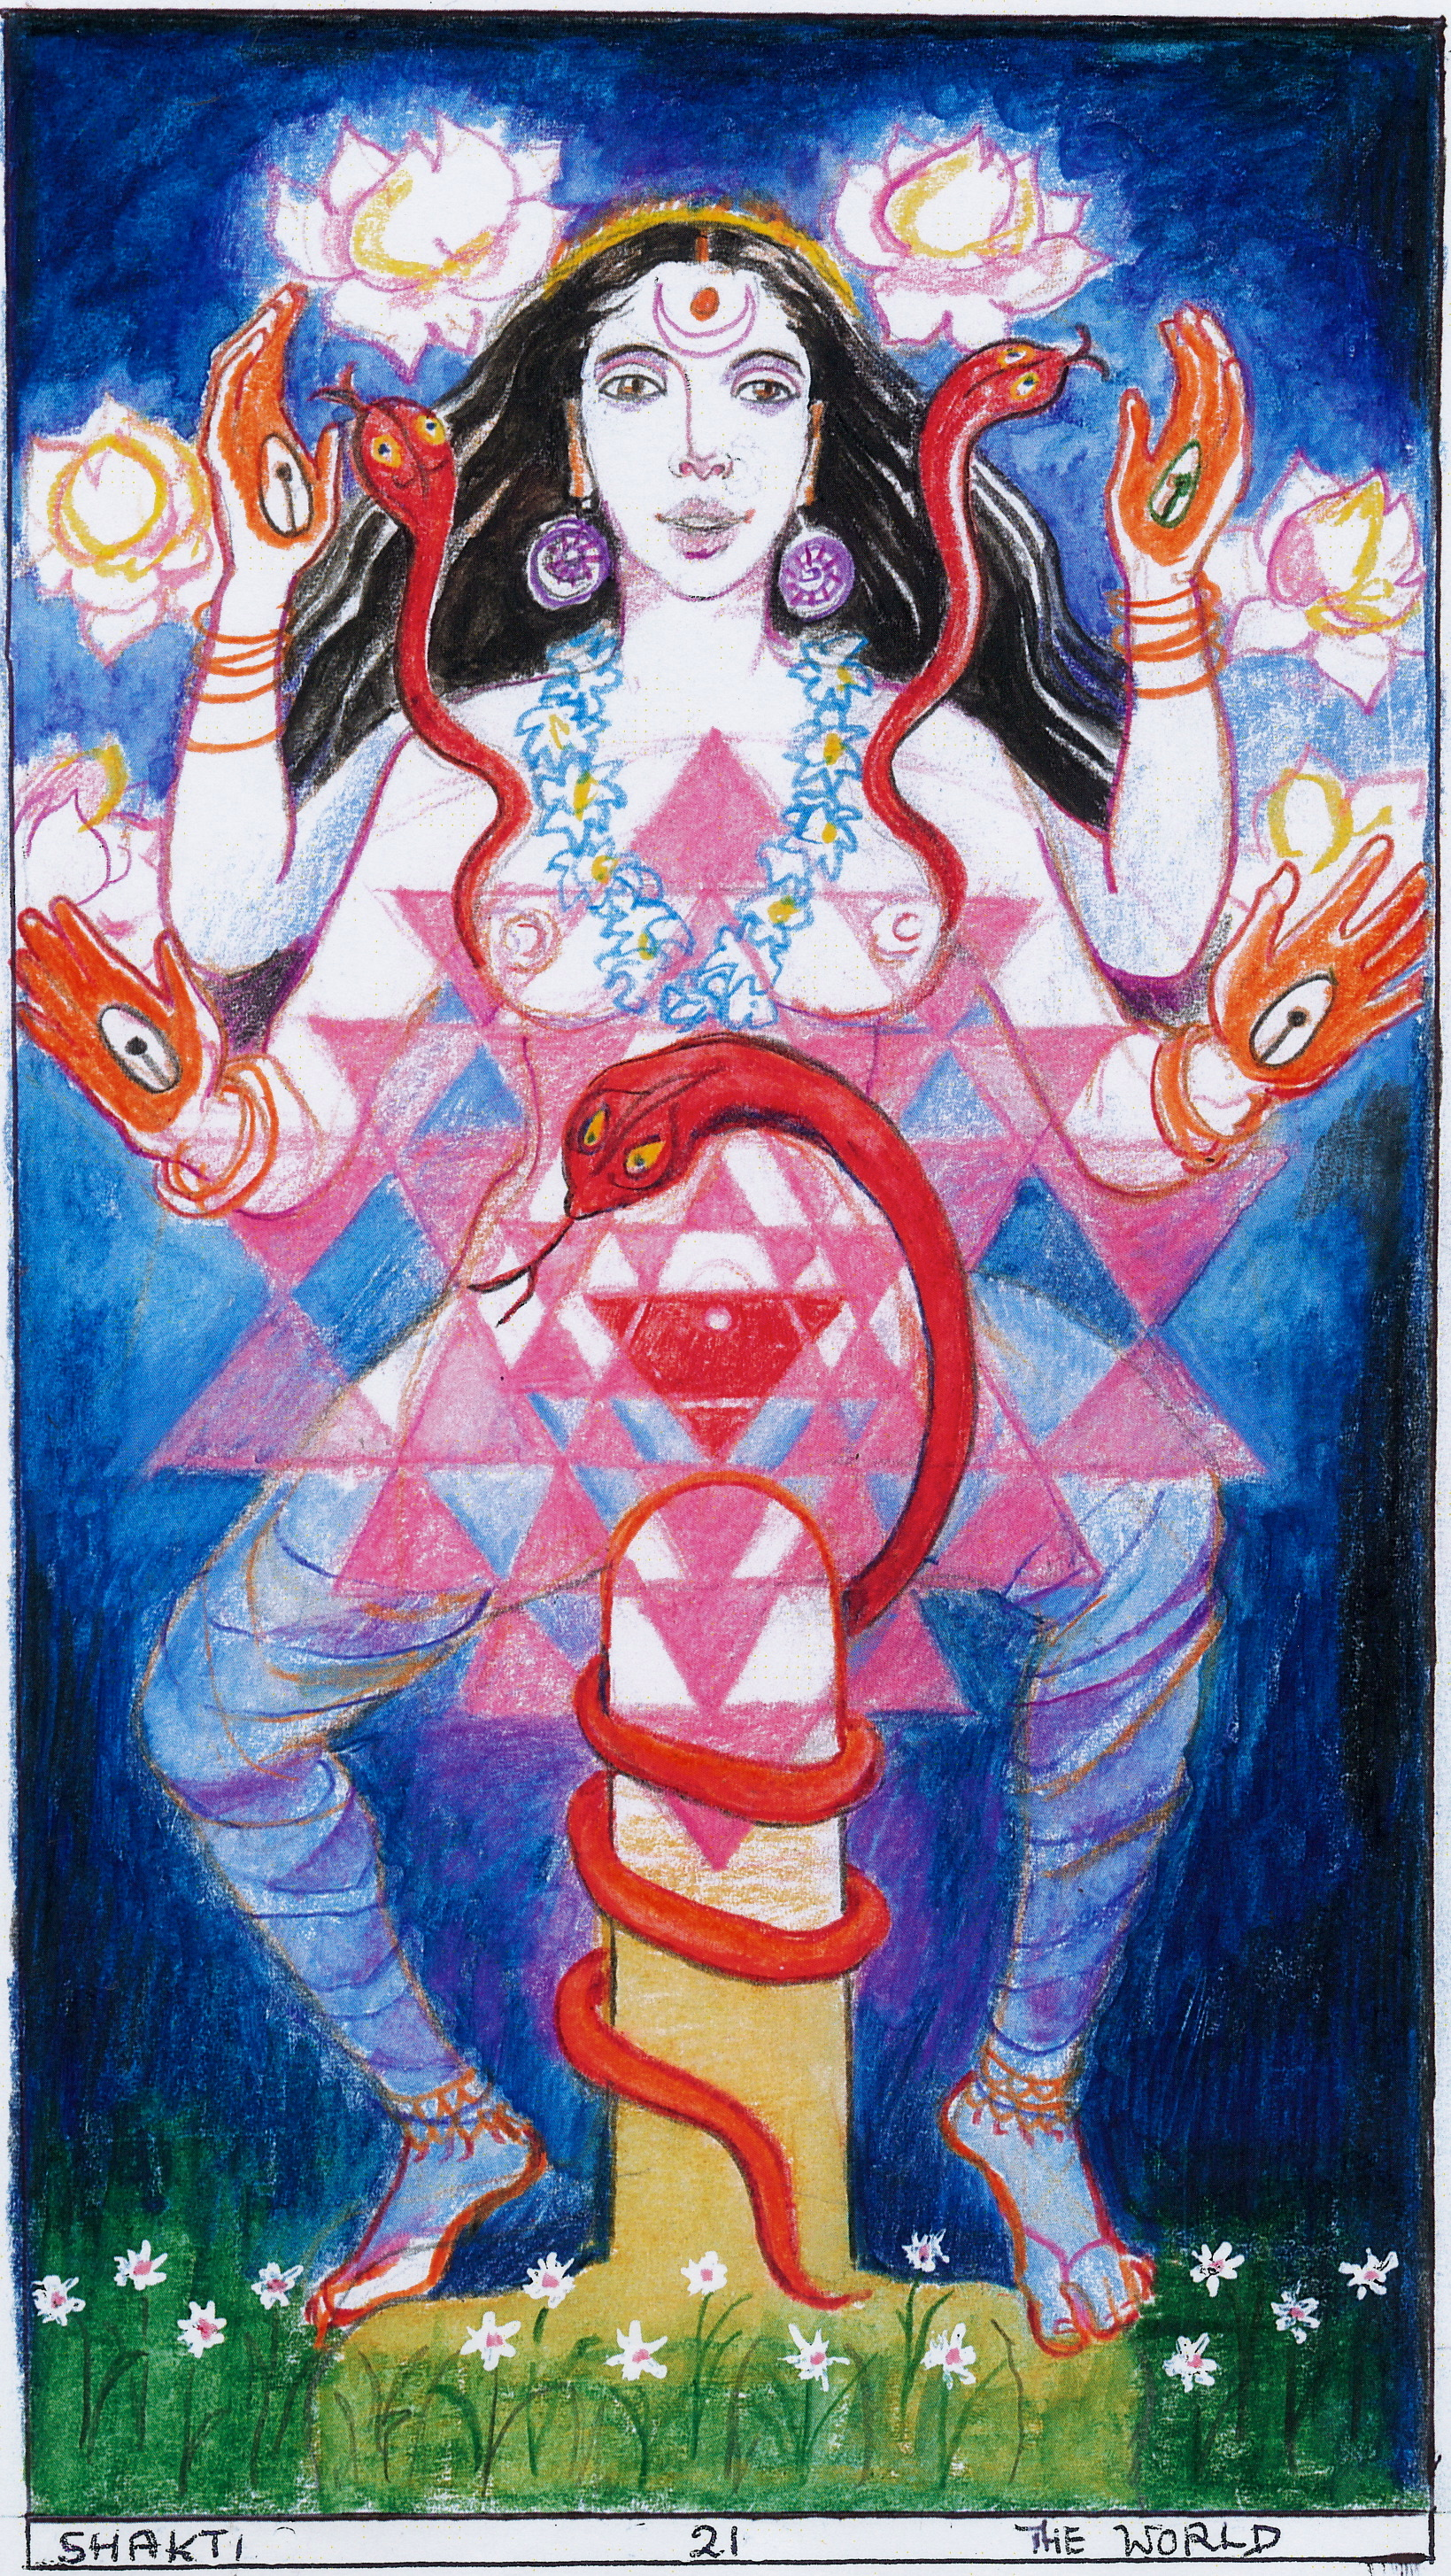 Sacred India Tarot world Shakti, 21